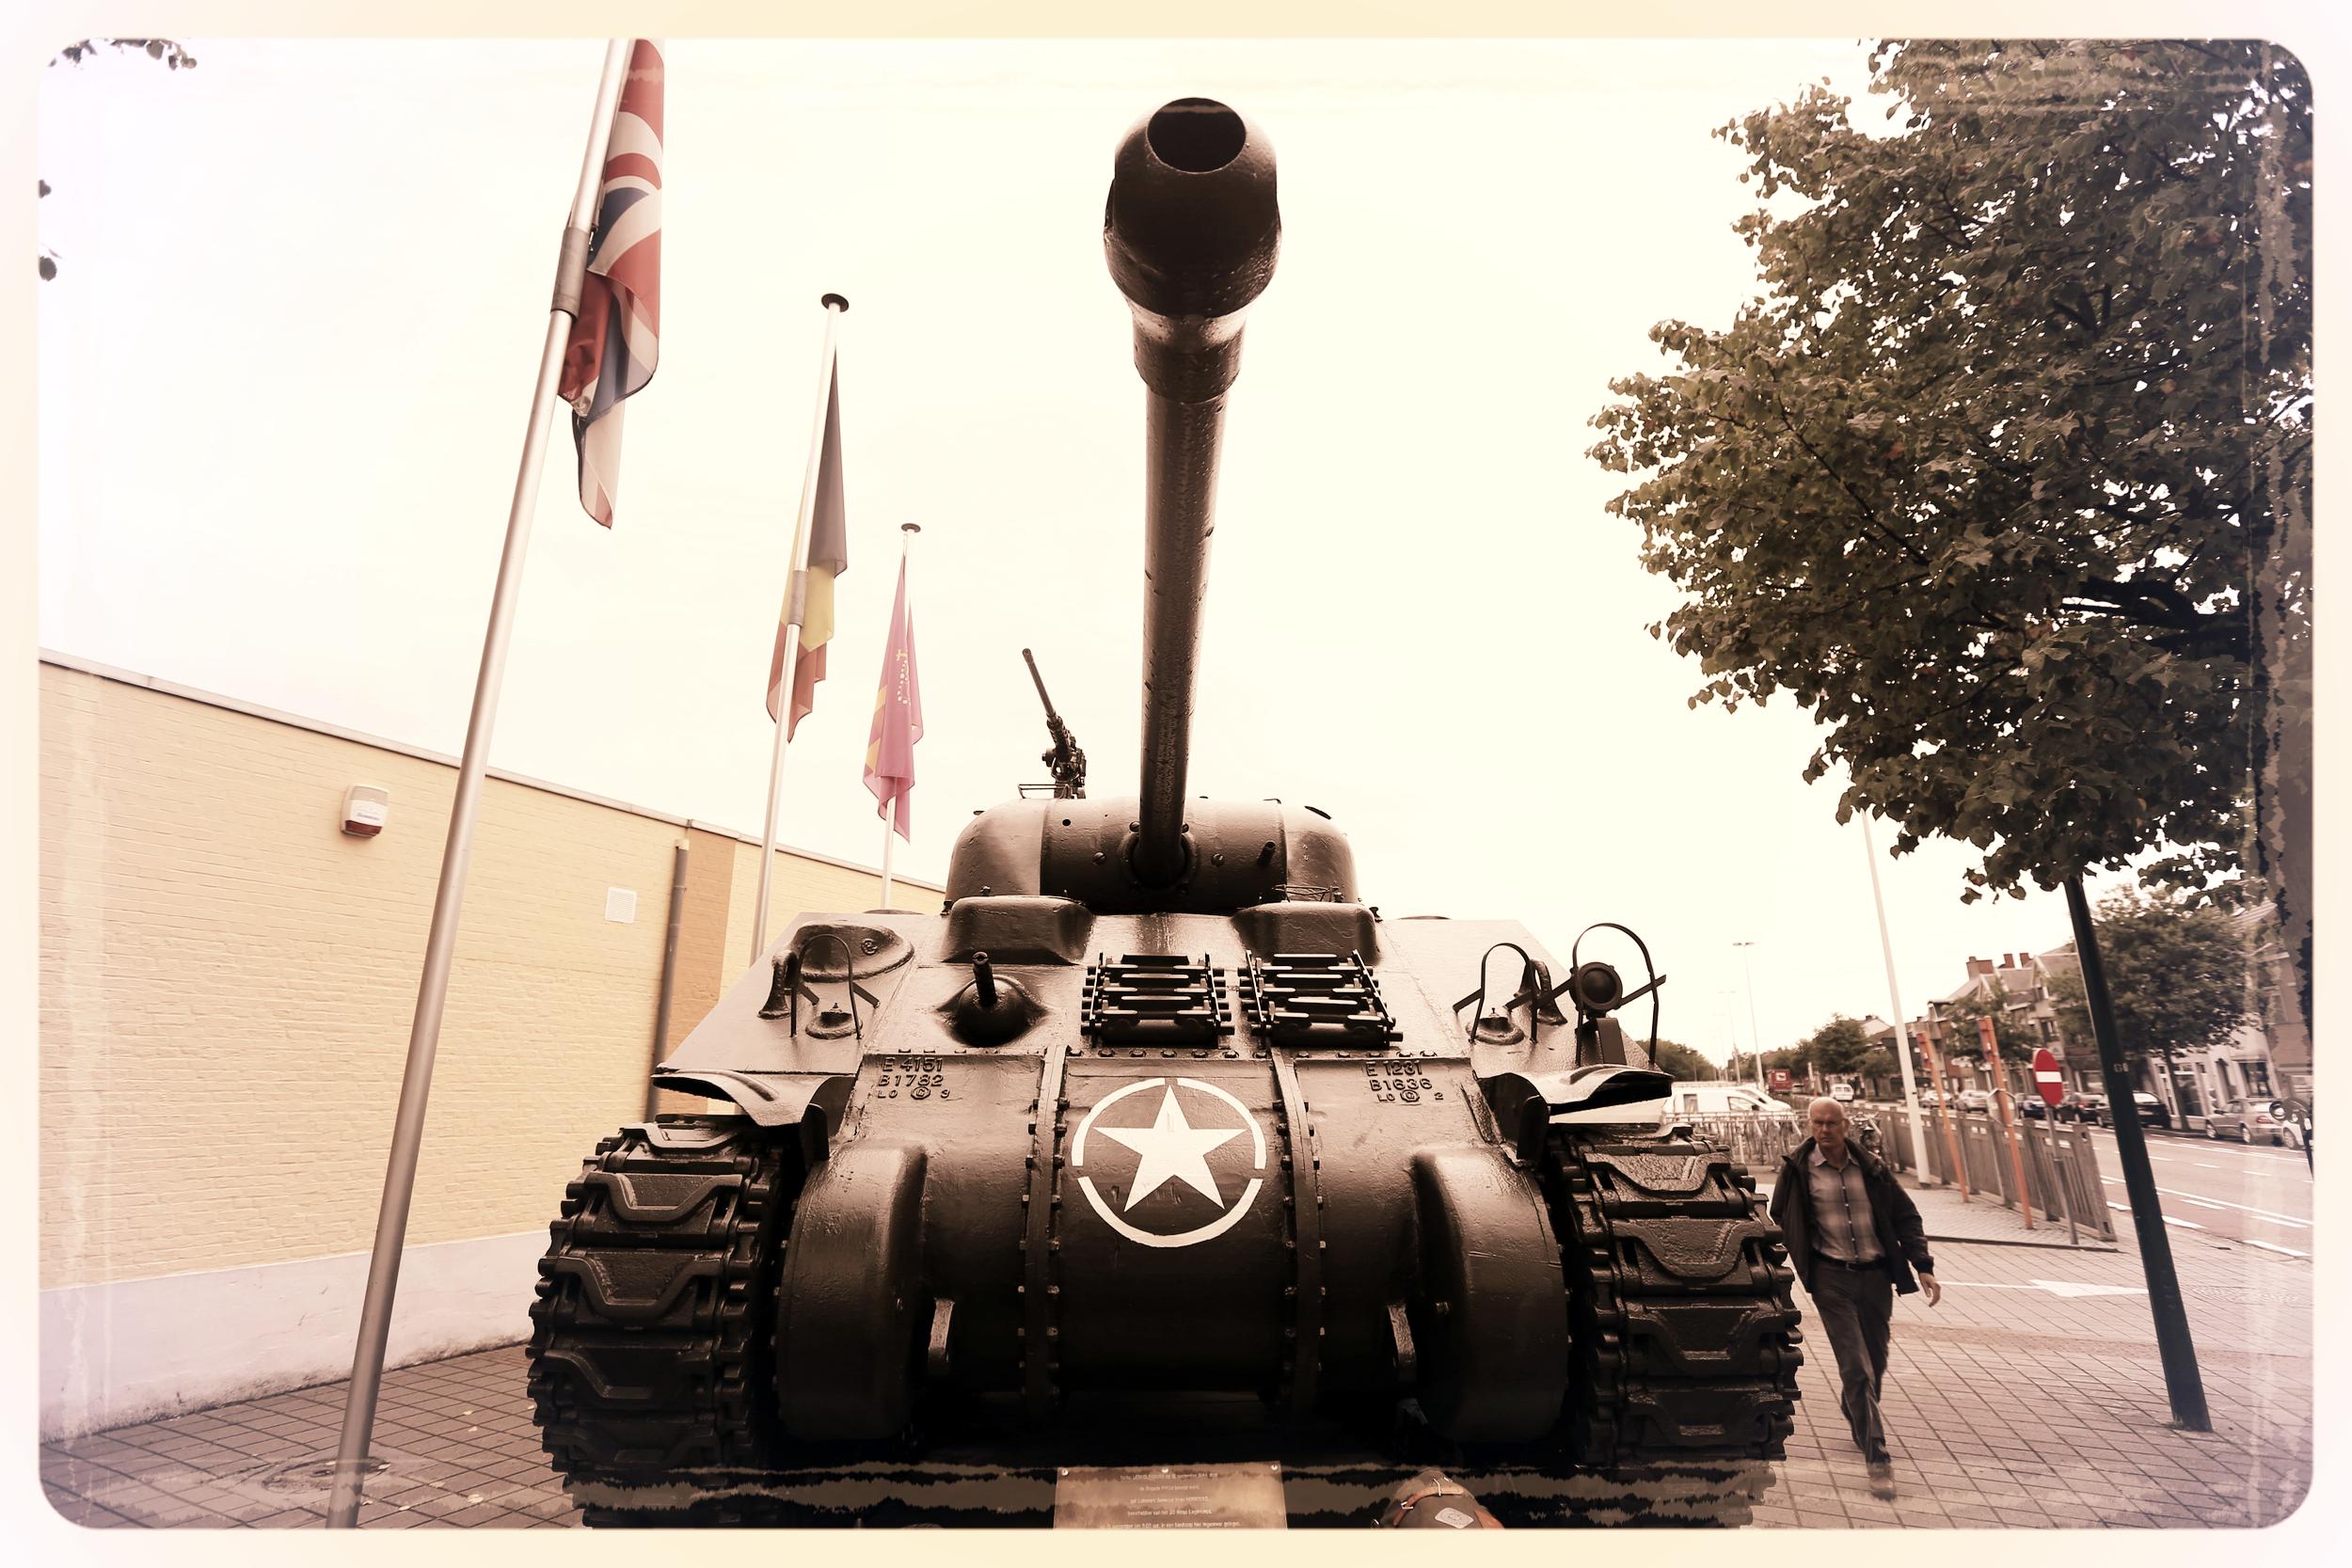 tank, wwII tank, wwii tank, military vehicle, army, army tank, belgium, bastogne, bastogne war museum, bikepacking blog, bicycle touring apocalypse, explore, travel photography, photography blog, raleigh bicycle, carradice, carradice longflap camper